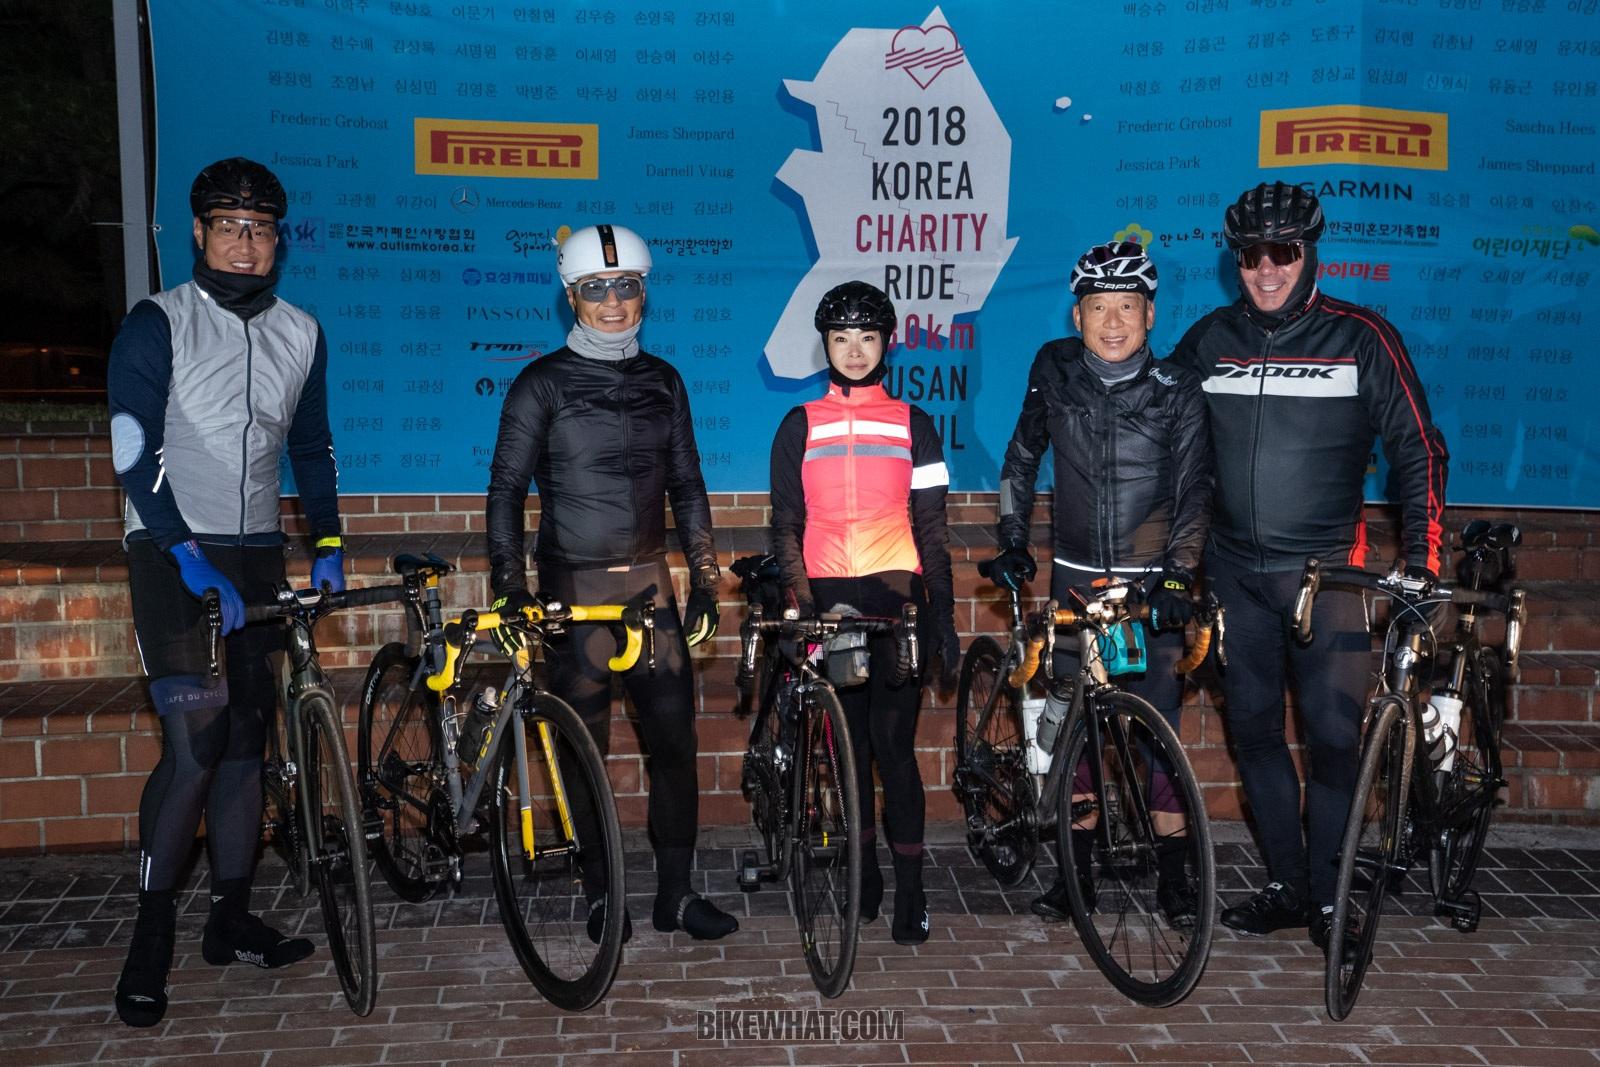 Charity_ride_2018 (17).jpg